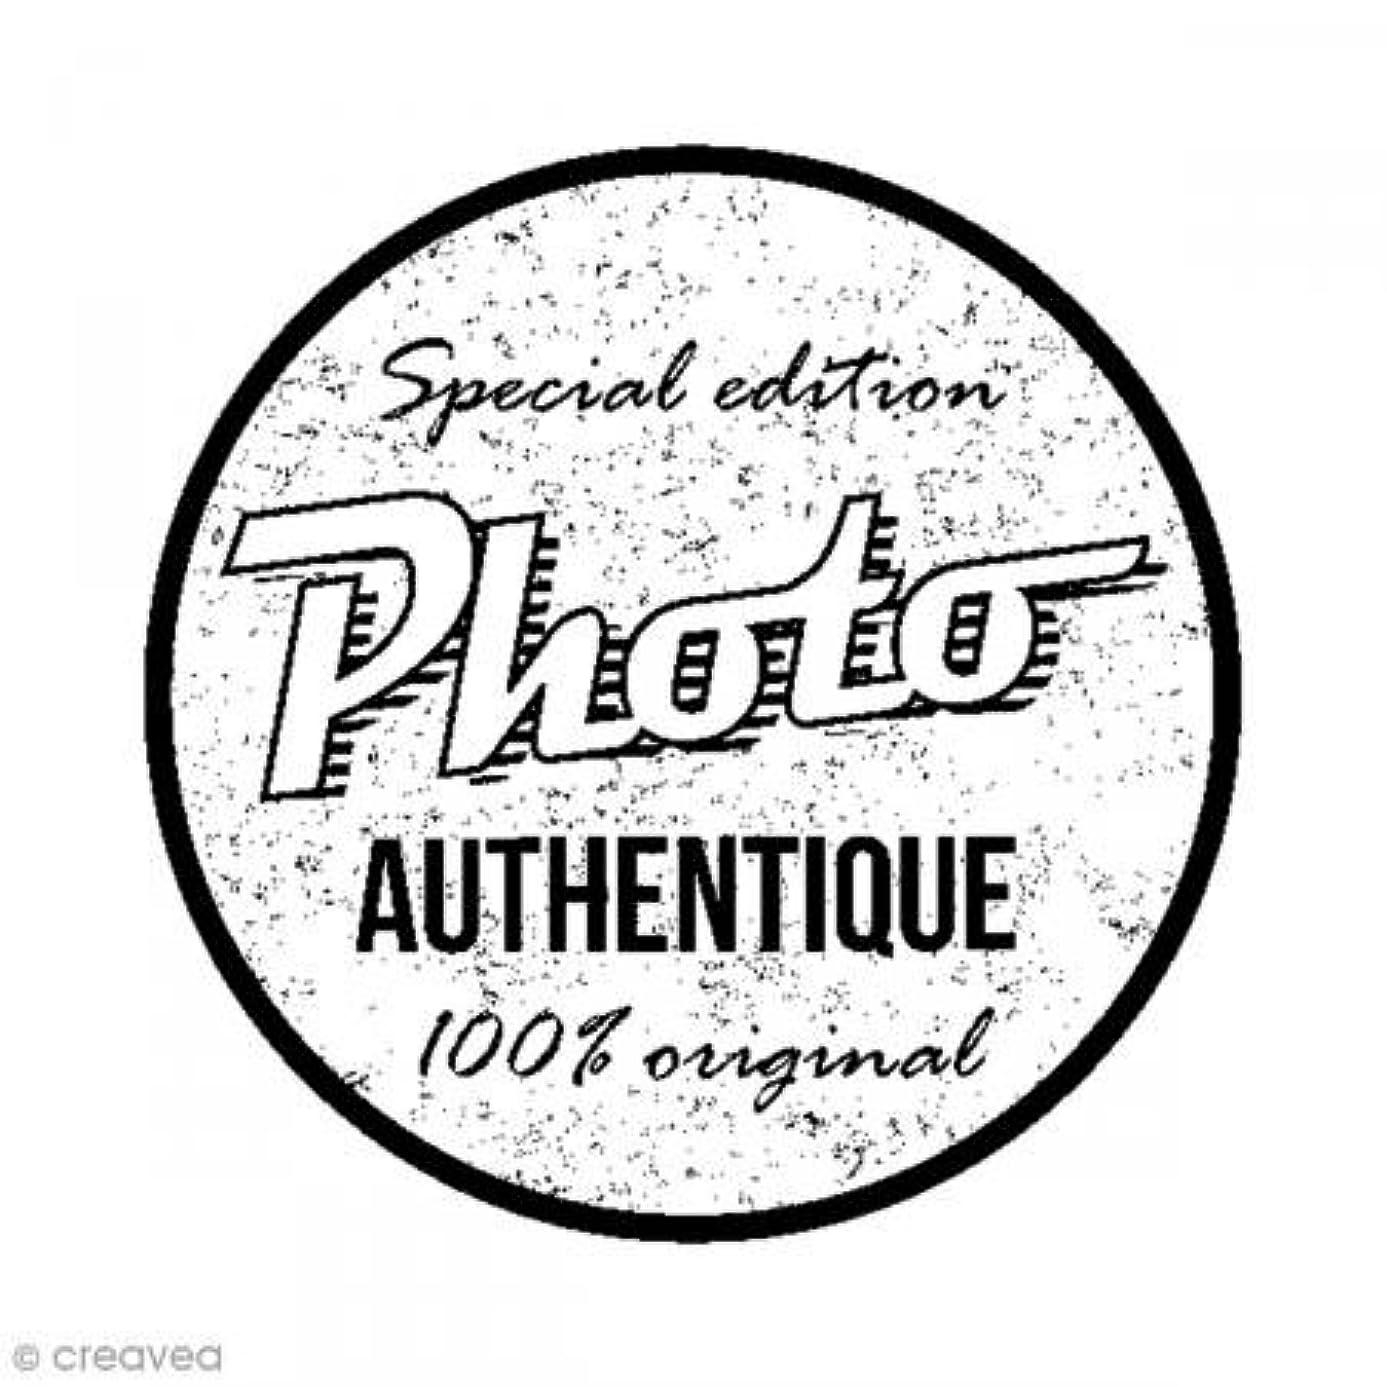 Artemio Stamp Photo Silver, Wood, Black, 4.5?x 2.5?x 4.5?cm